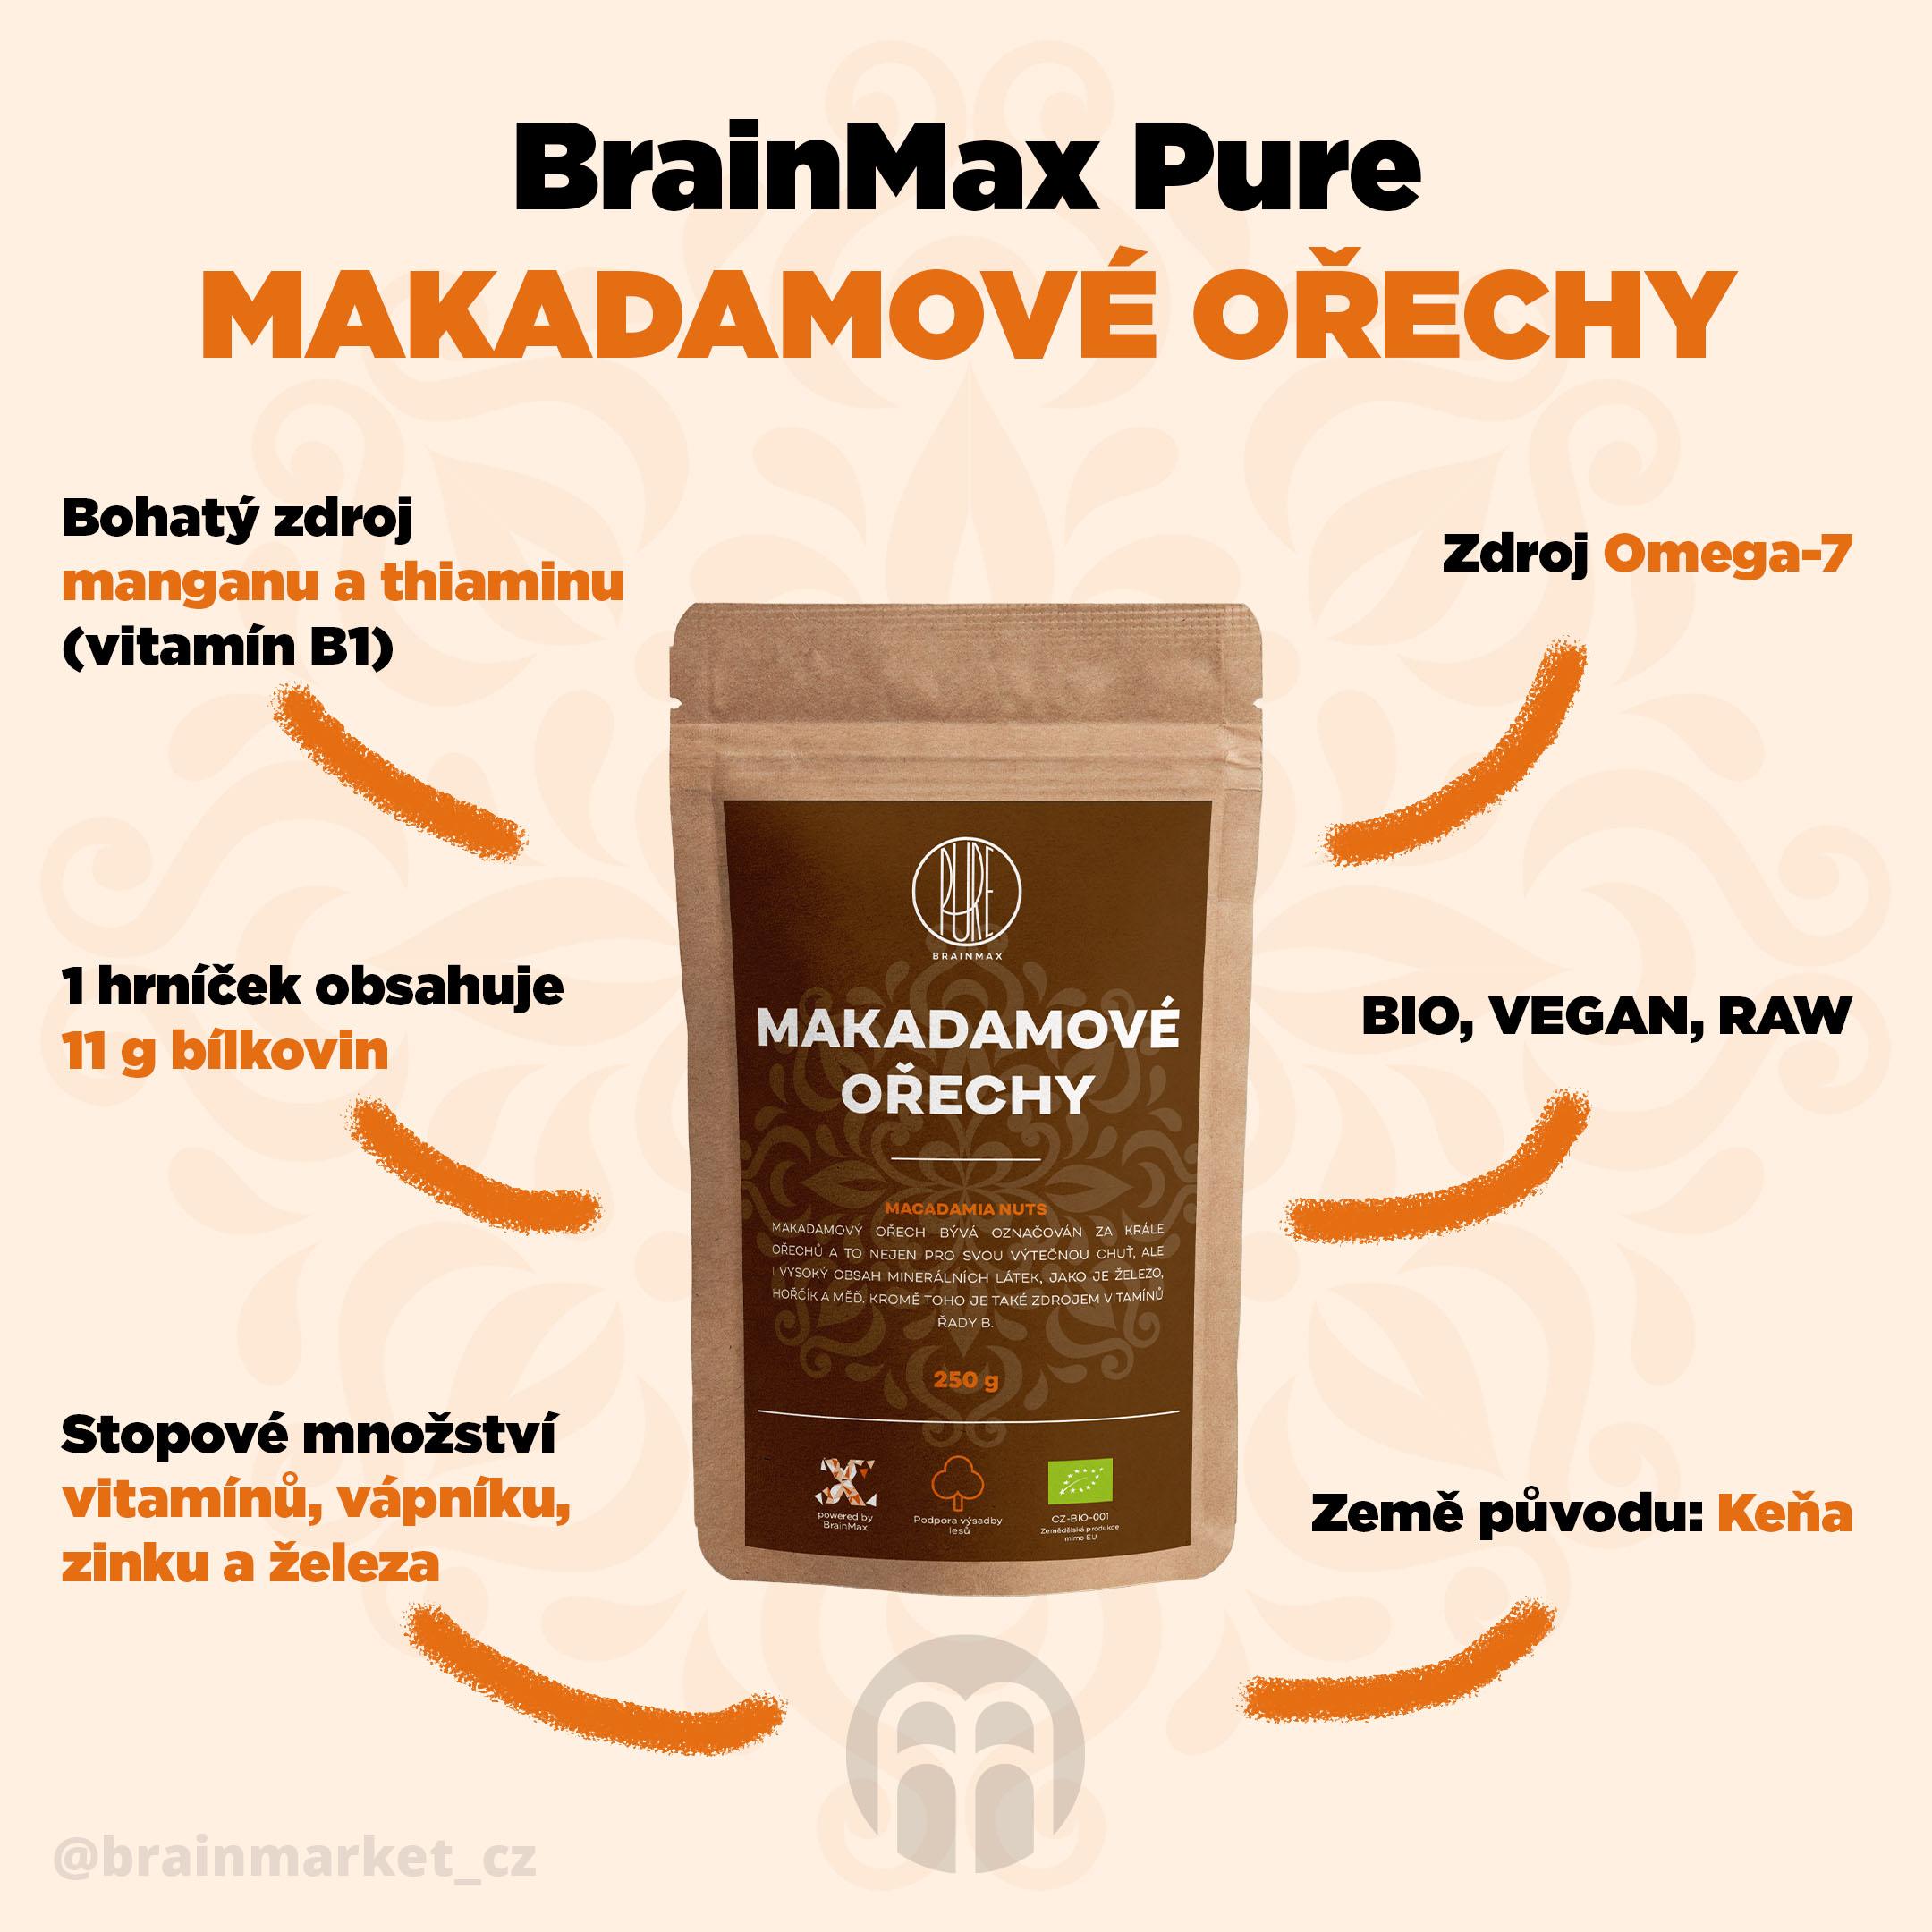 makadamove-orechy-brainmax-pure-infografika-brainmarket-cz